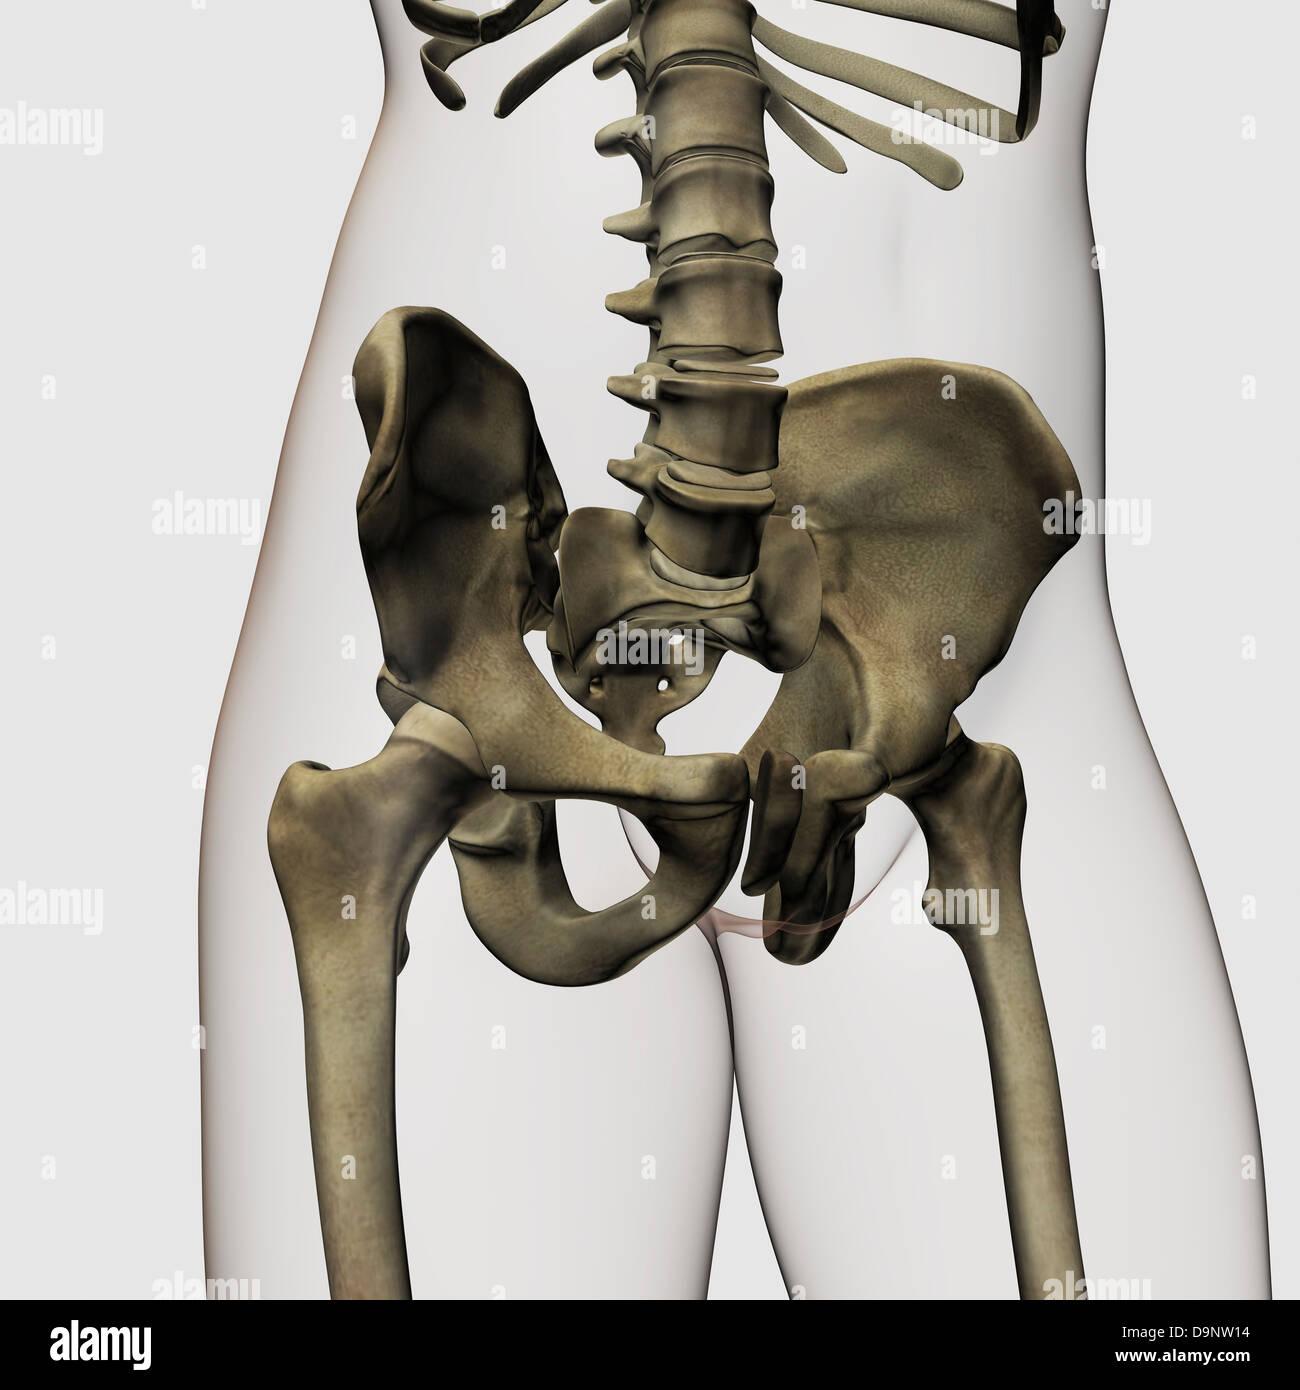 Three dimensional view of human pelvic bones. - Stock Image